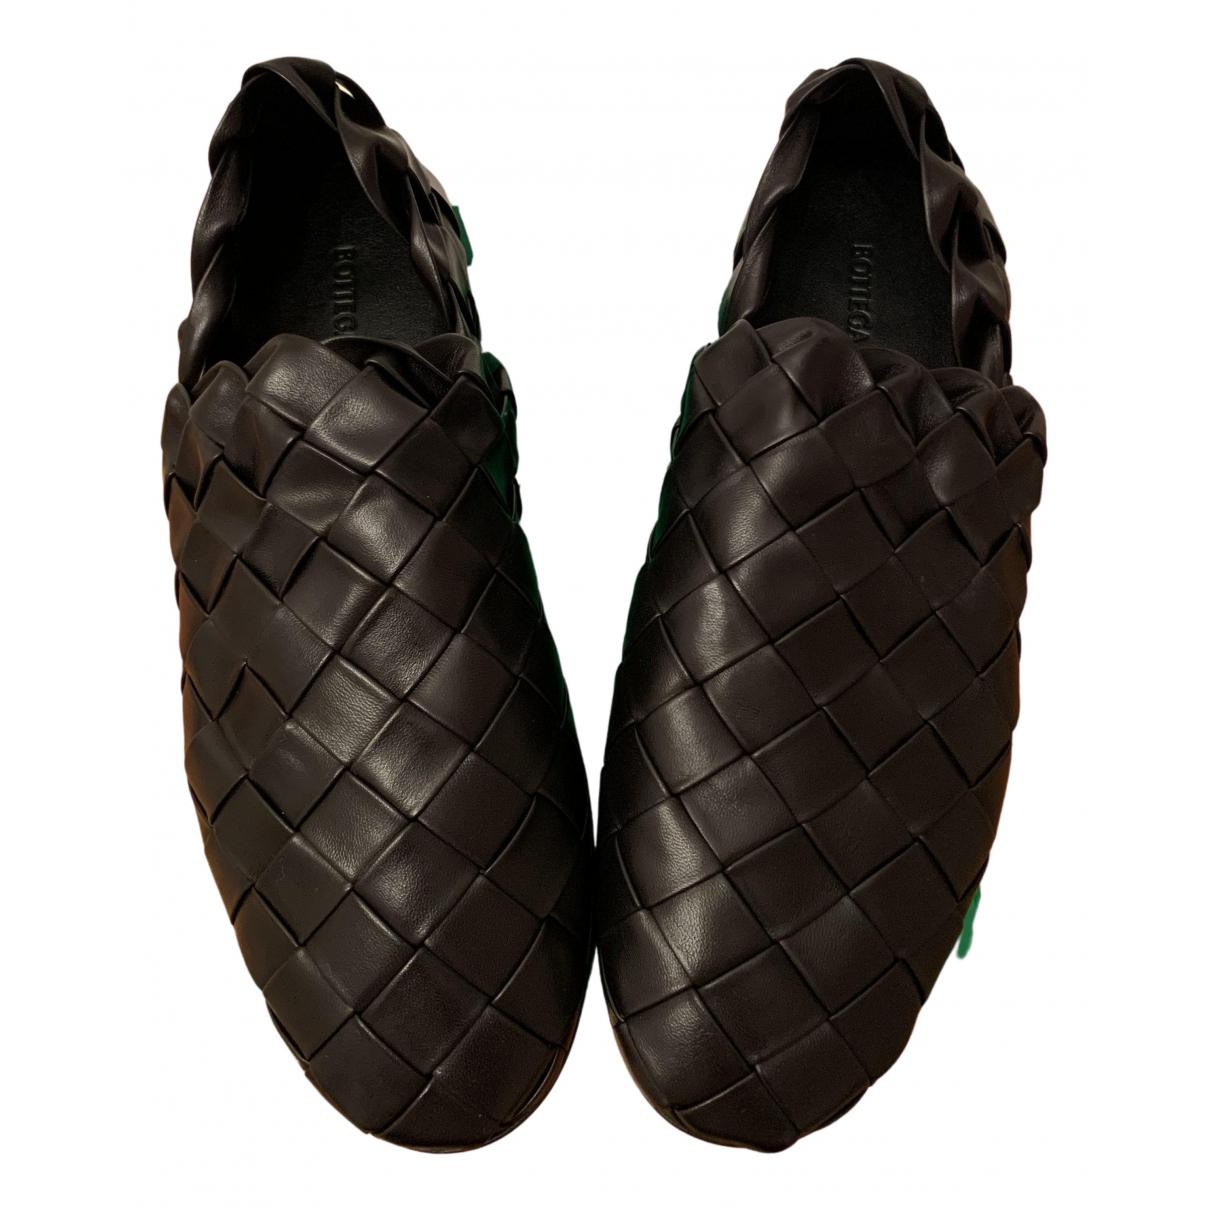 Bottega Veneta N Black Leather Flats for Women 36 EU